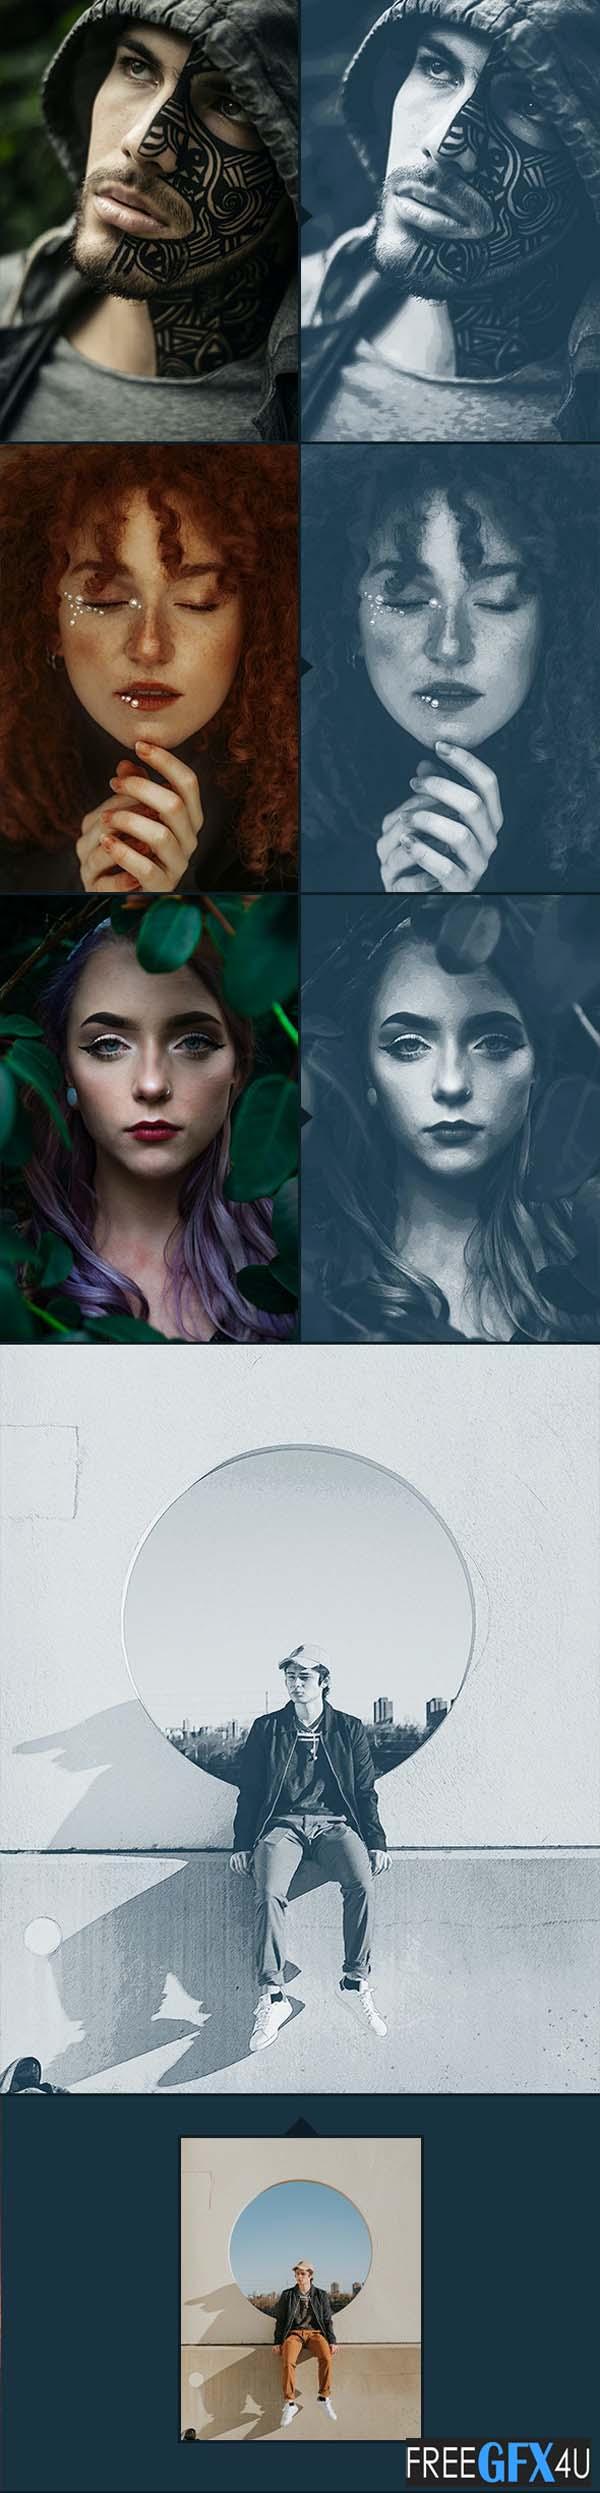 Painted ART - Artistic Photoshop Action Vol-2